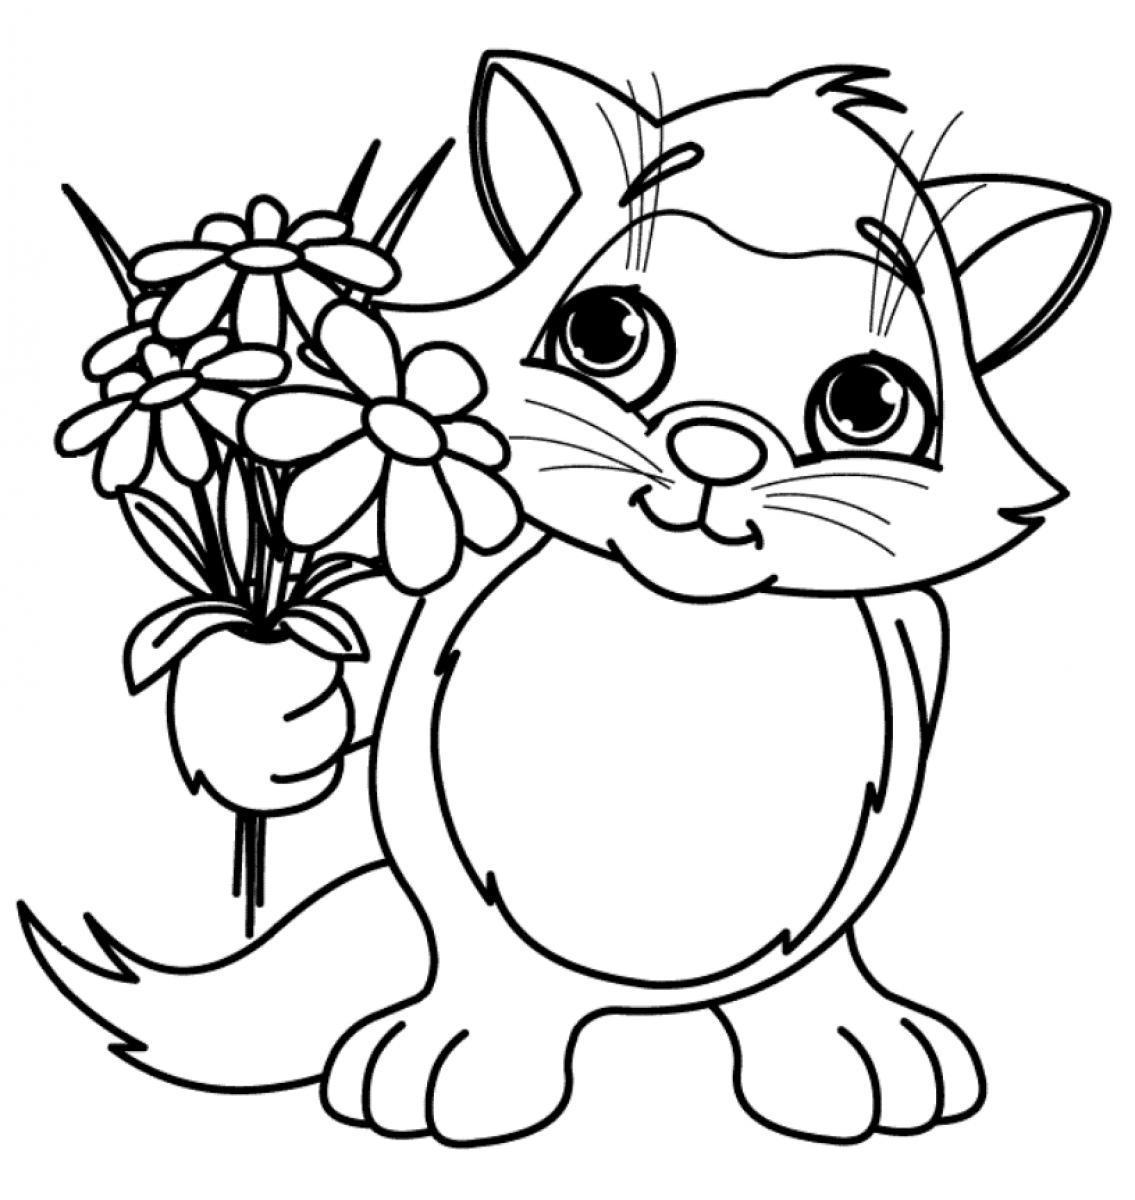 free printable preschool flower coloring pages free spring flower printable coloring image clip art flower free preschool coloring printable pages